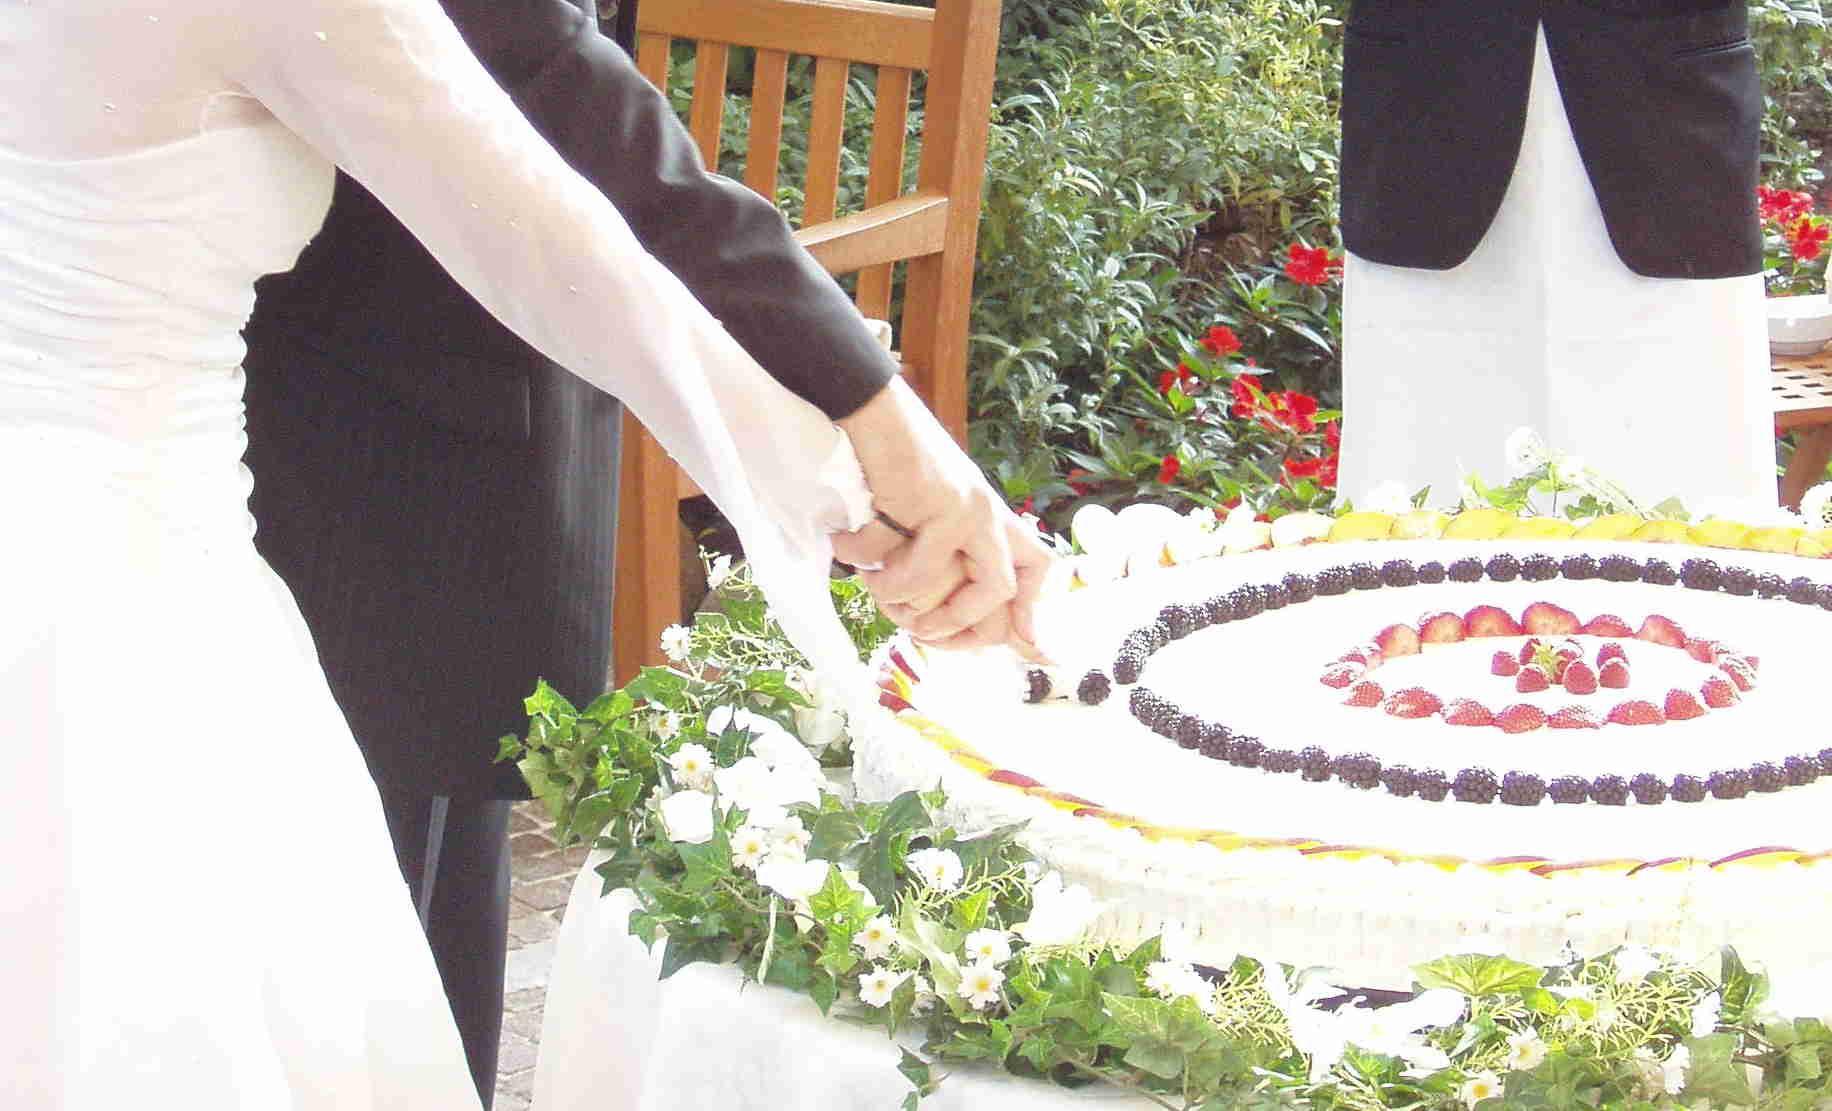 Matrimoni, un business da 6 miliardi in Lombardia